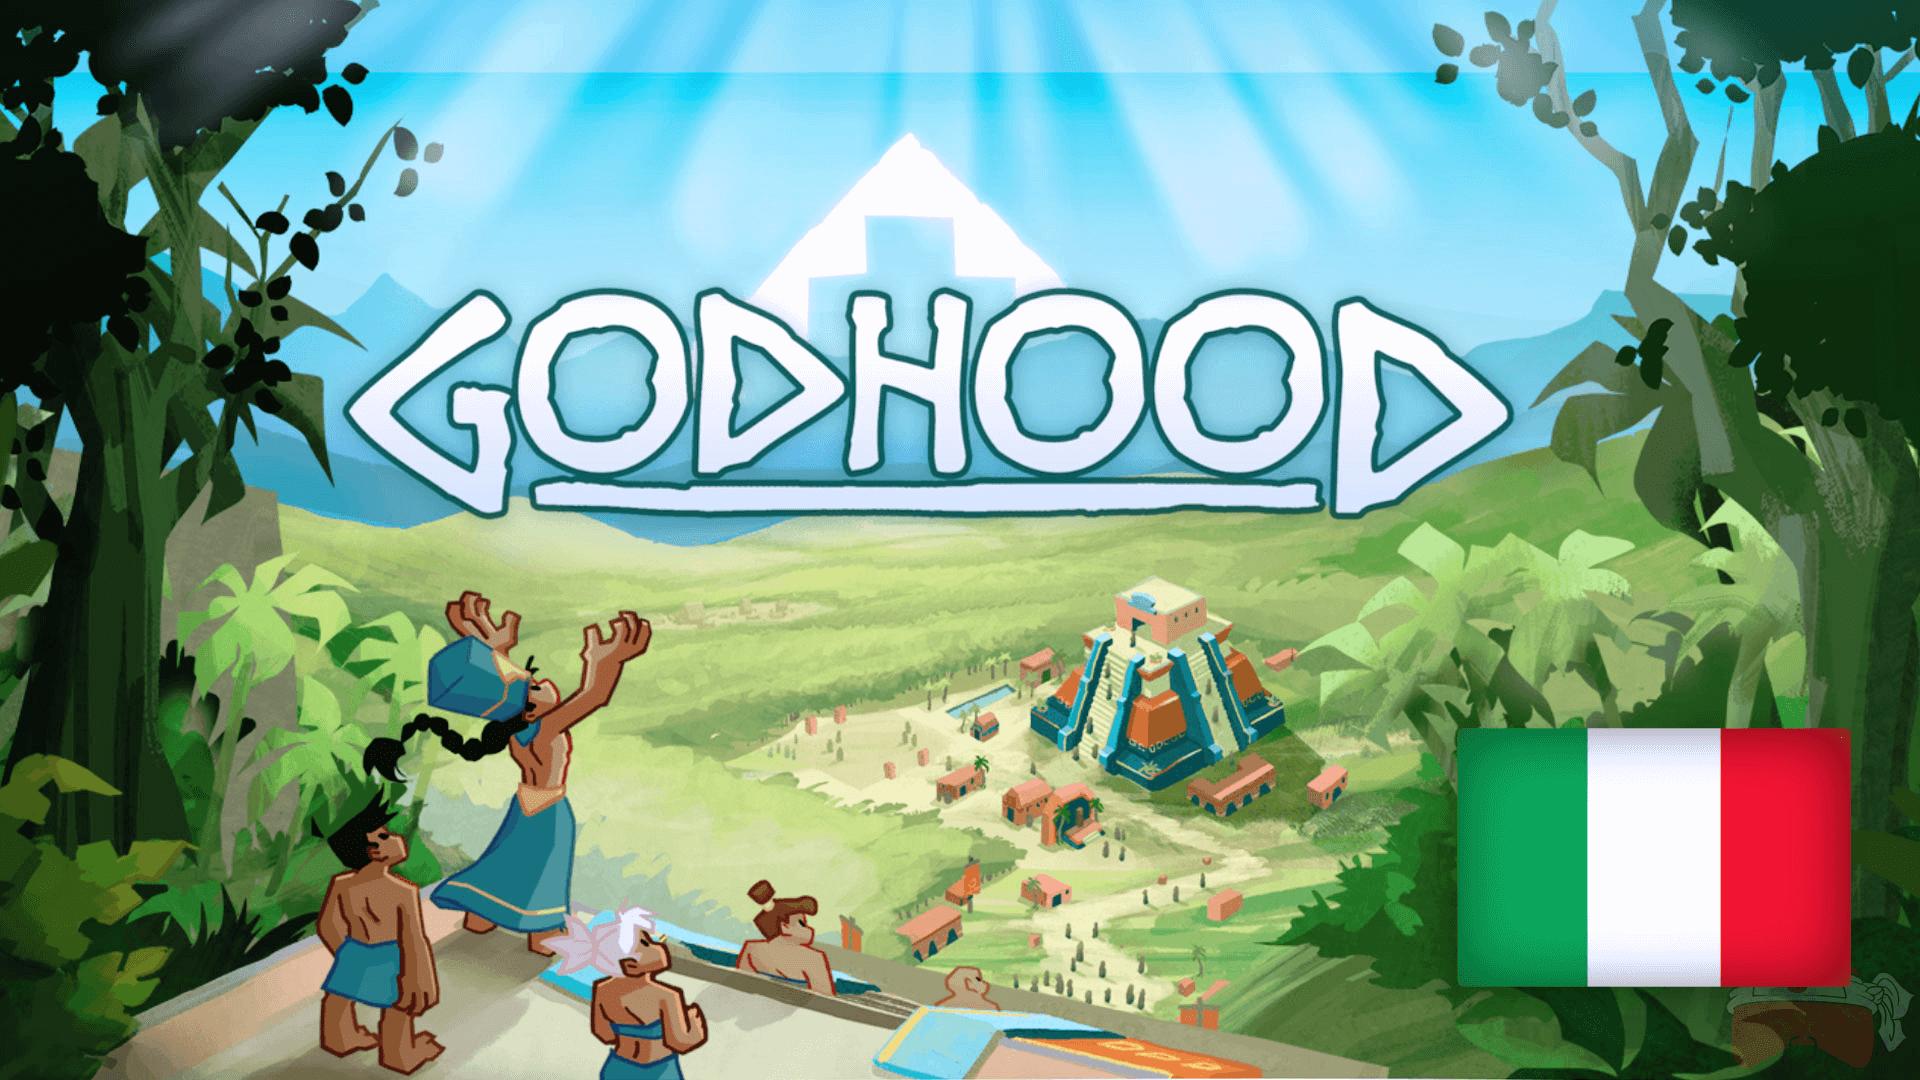 GodHood sfondo (1).png